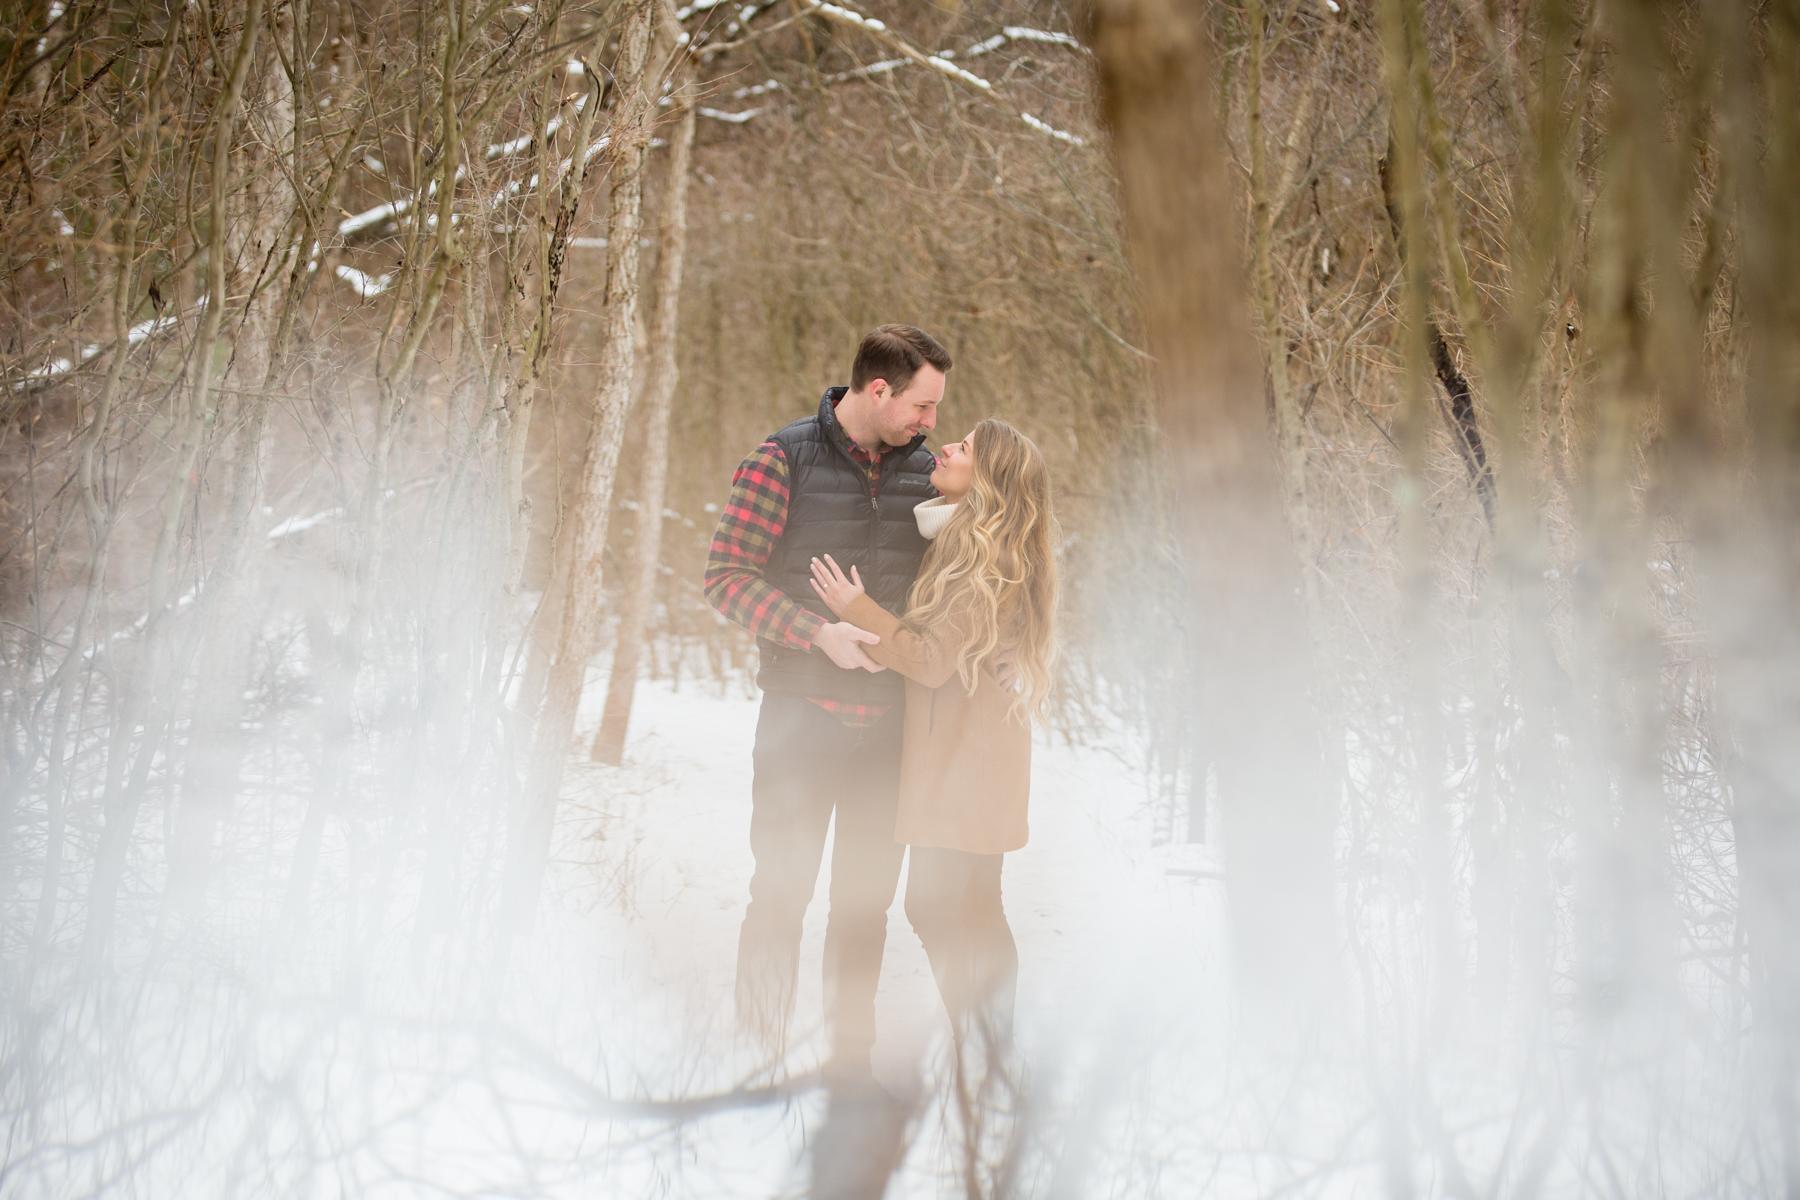 Doug&Kara_winter_Engagment_Photos_Brandon_Shafer_Photography_Blog-6.jpg